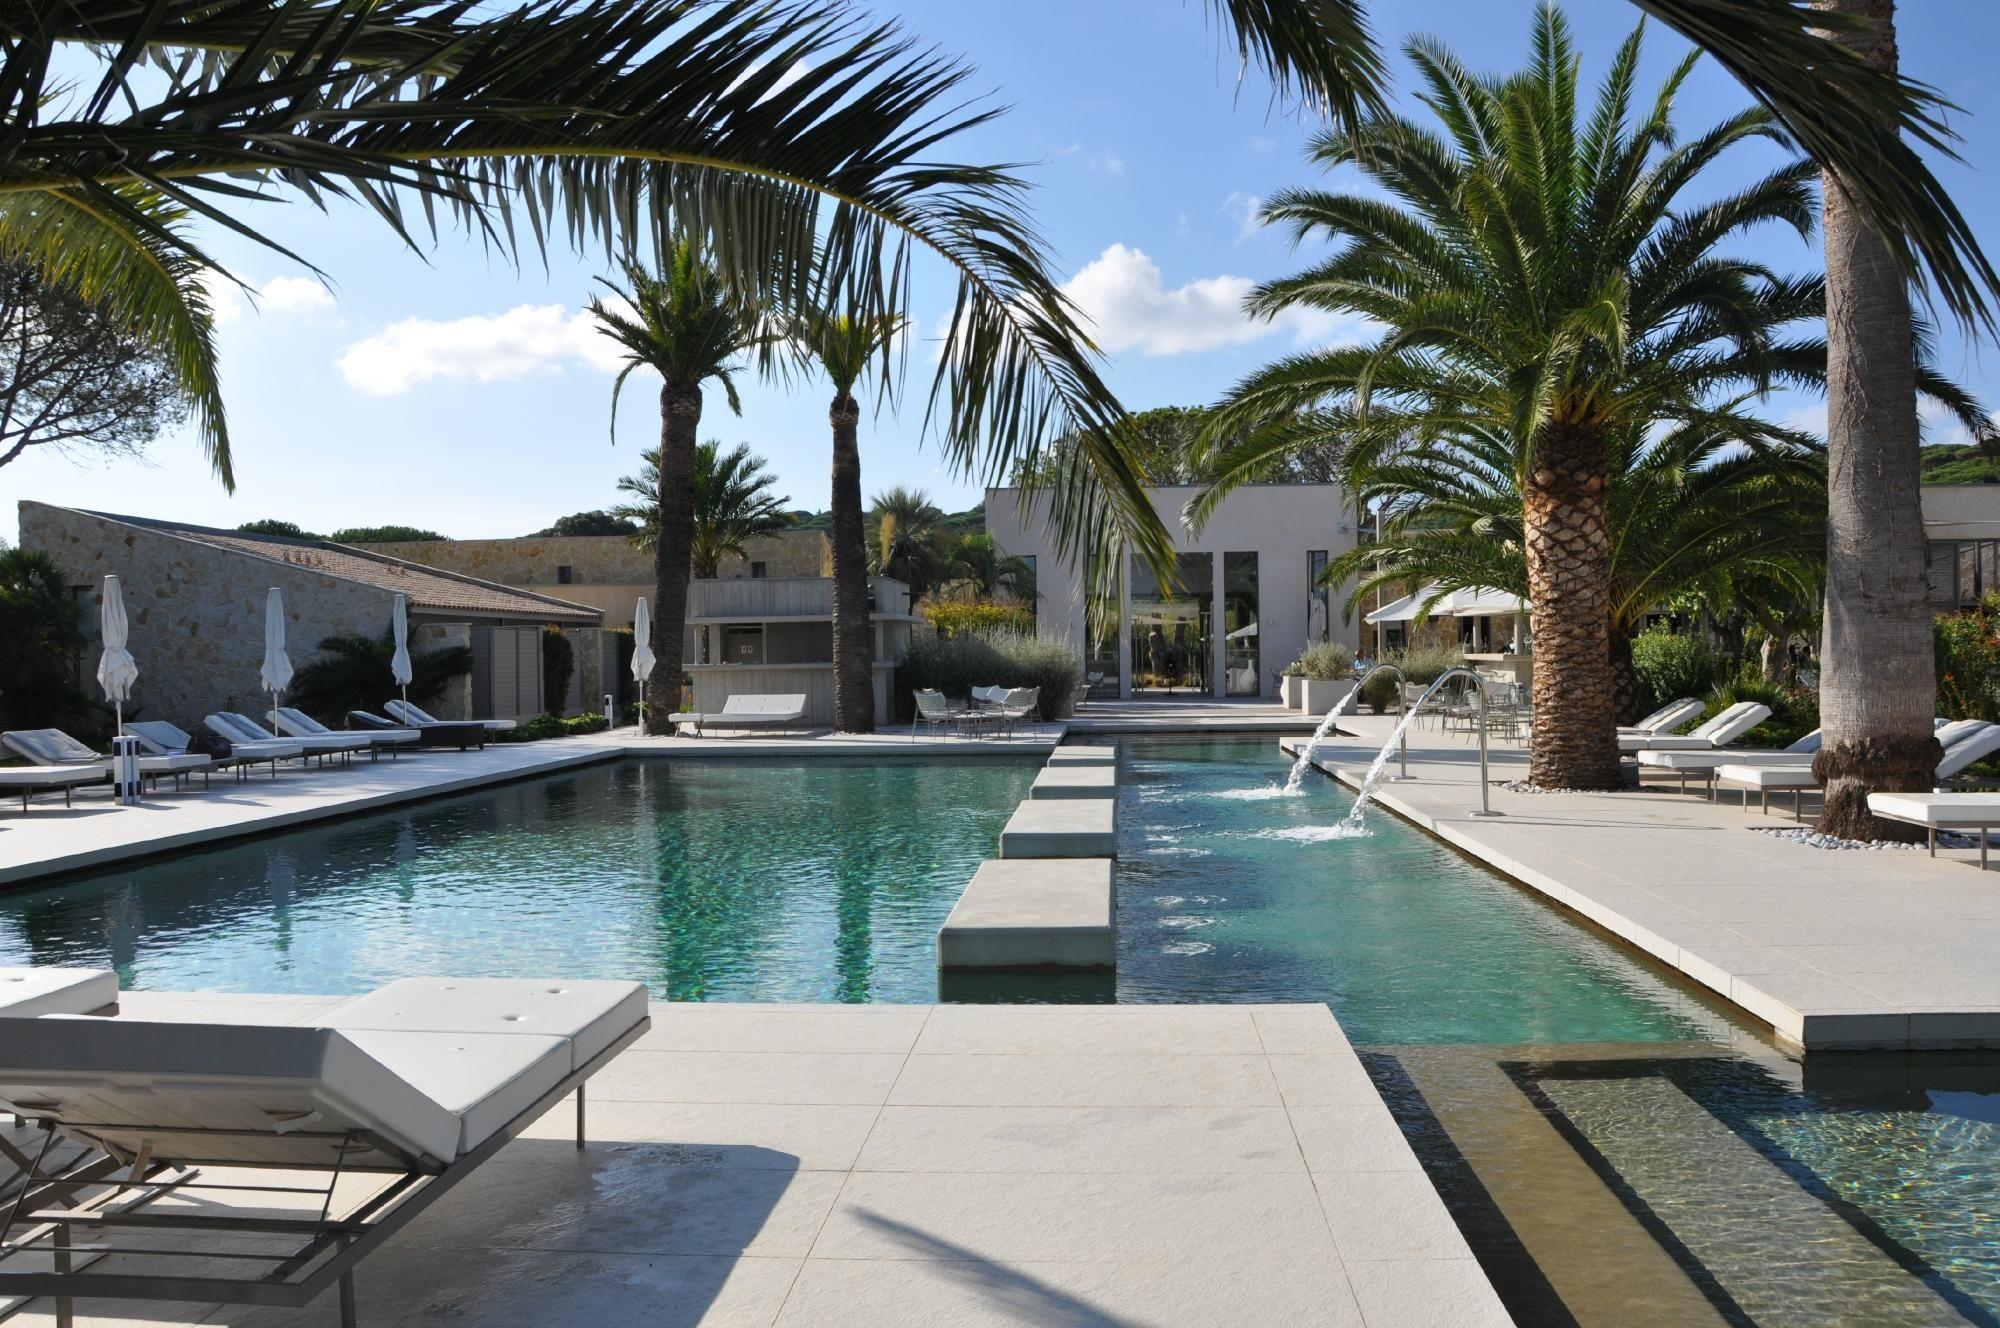 8 Glamorous Hotel Pools Sezz Saint Tropez Saint Tropez Hotel Pool Pool